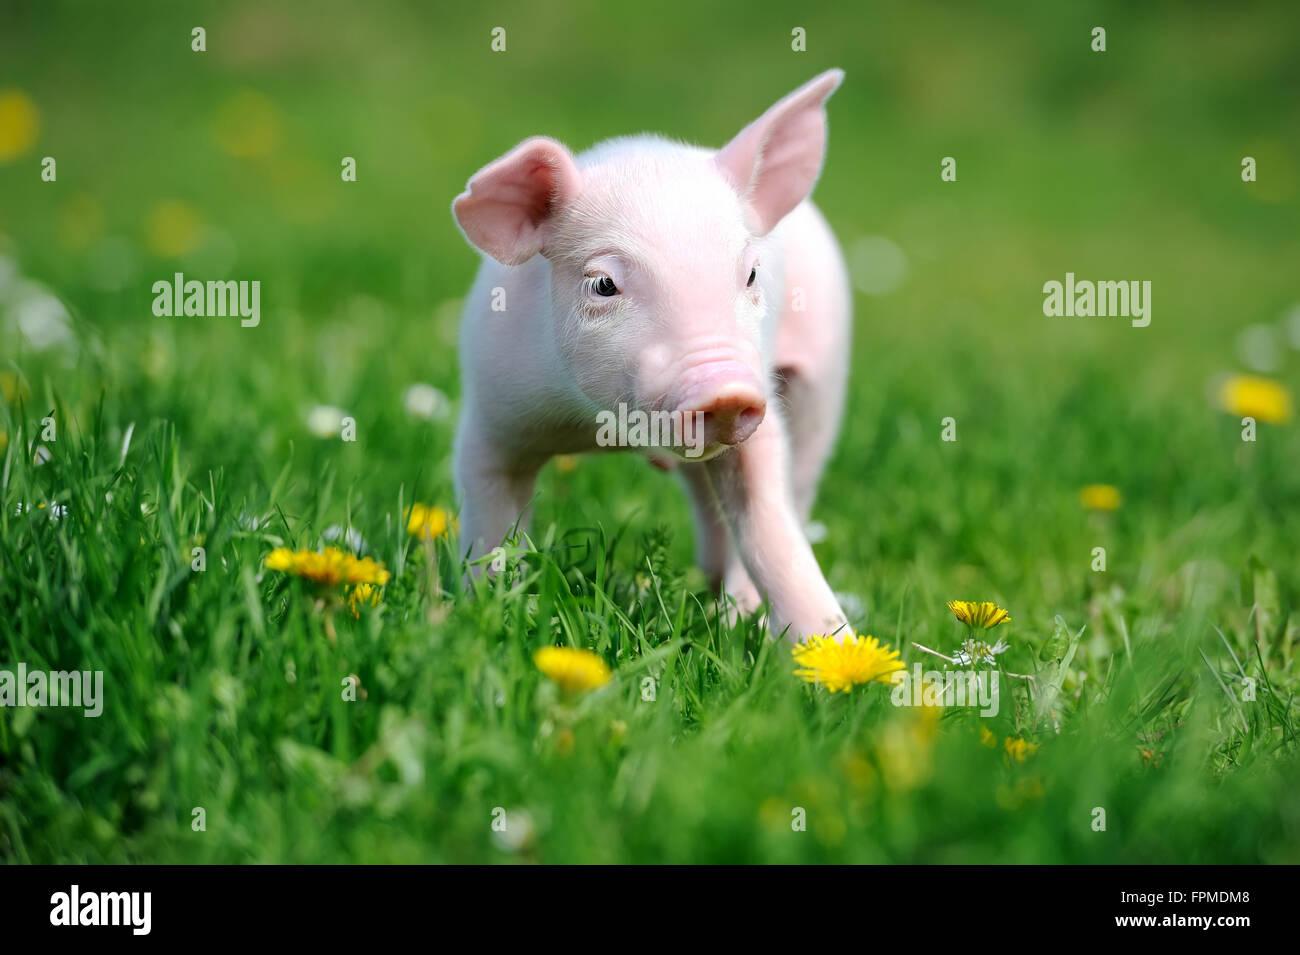 Junge Schwein ein Frühlingsgrün Gras Stockbild